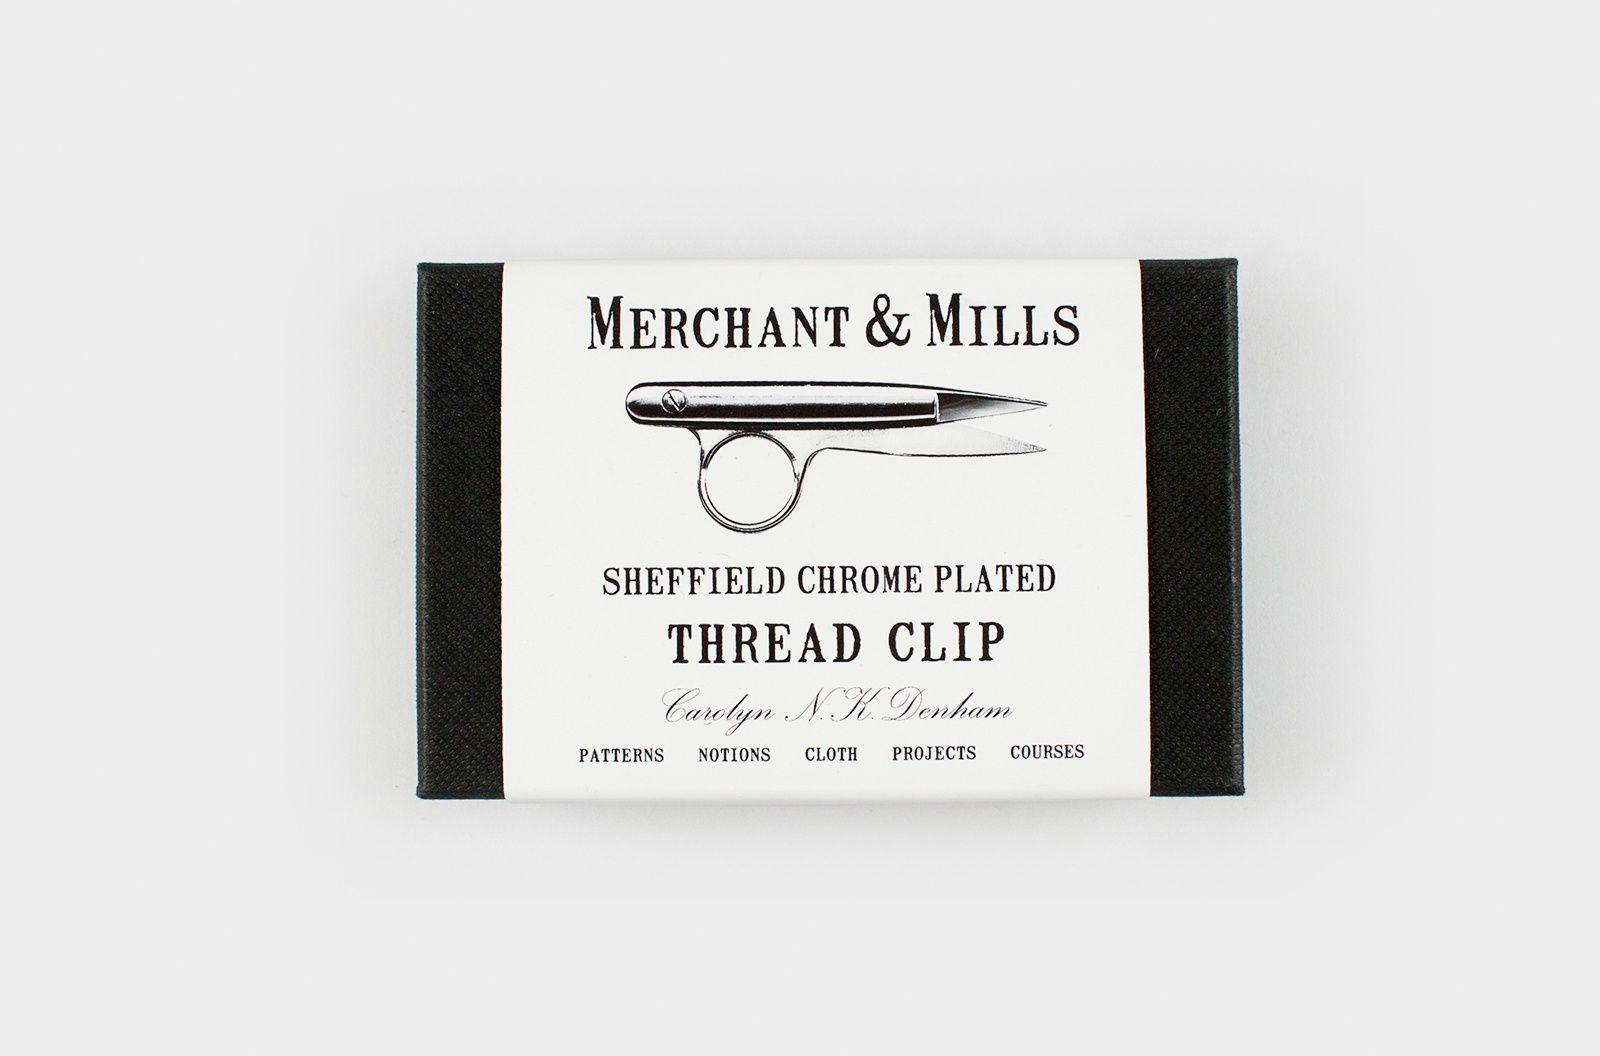 "Merchant & Mills 4.5"" 紗剪 | TOOLS to LIVEBY / 禮拜文房具 - 改變桌上的風景"